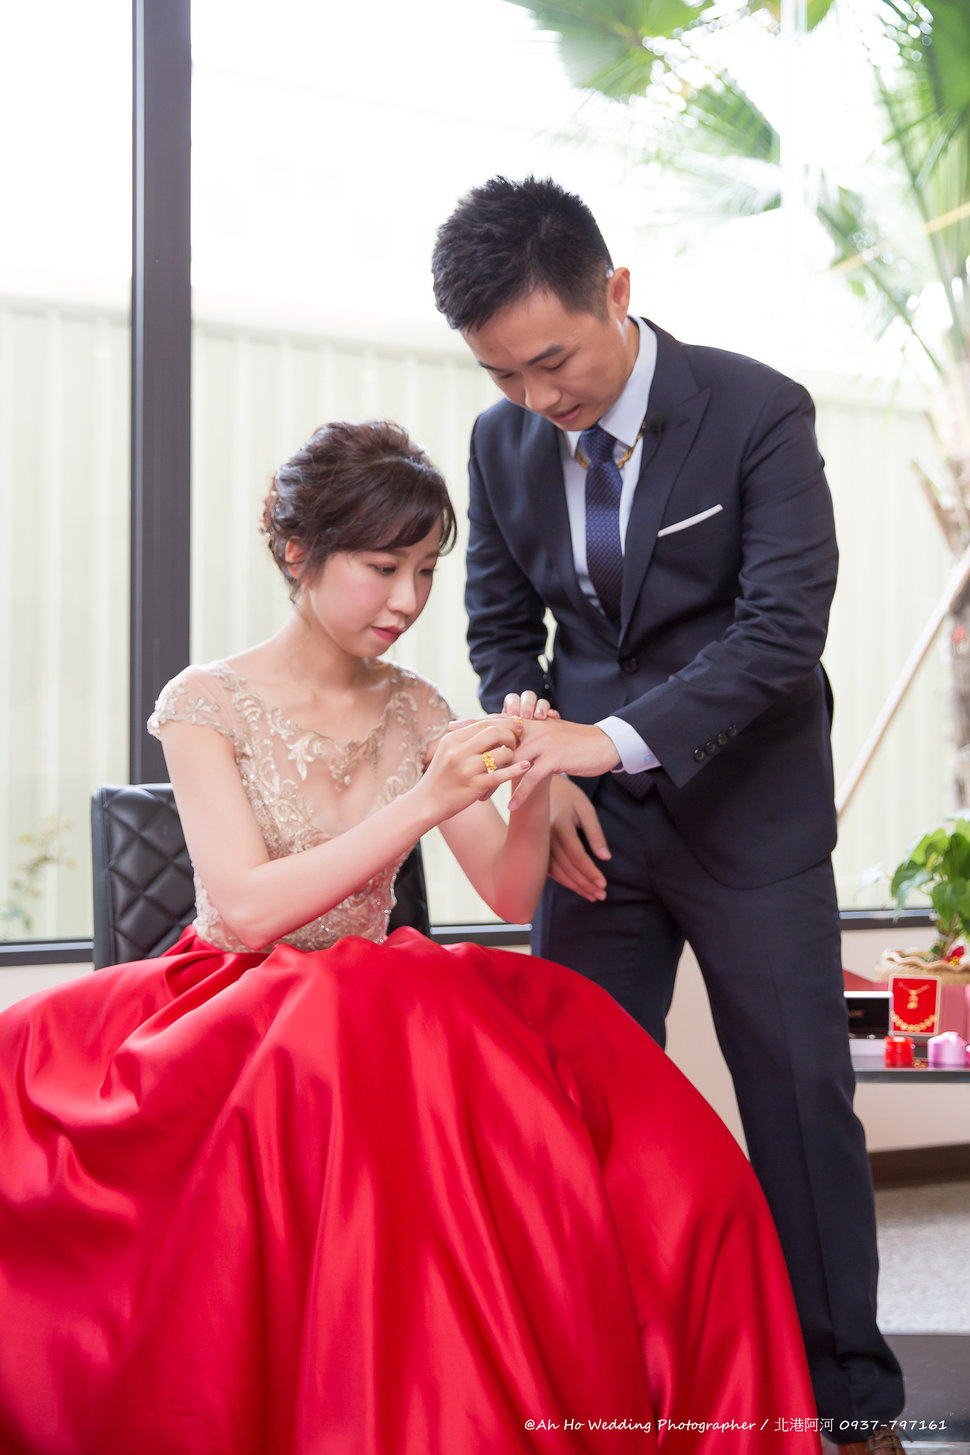 AhHo Wedding TEL-0937797161 lineID-chiupeiho-58 - 北港阿河婚攝 AhHoWedding - 結婚吧